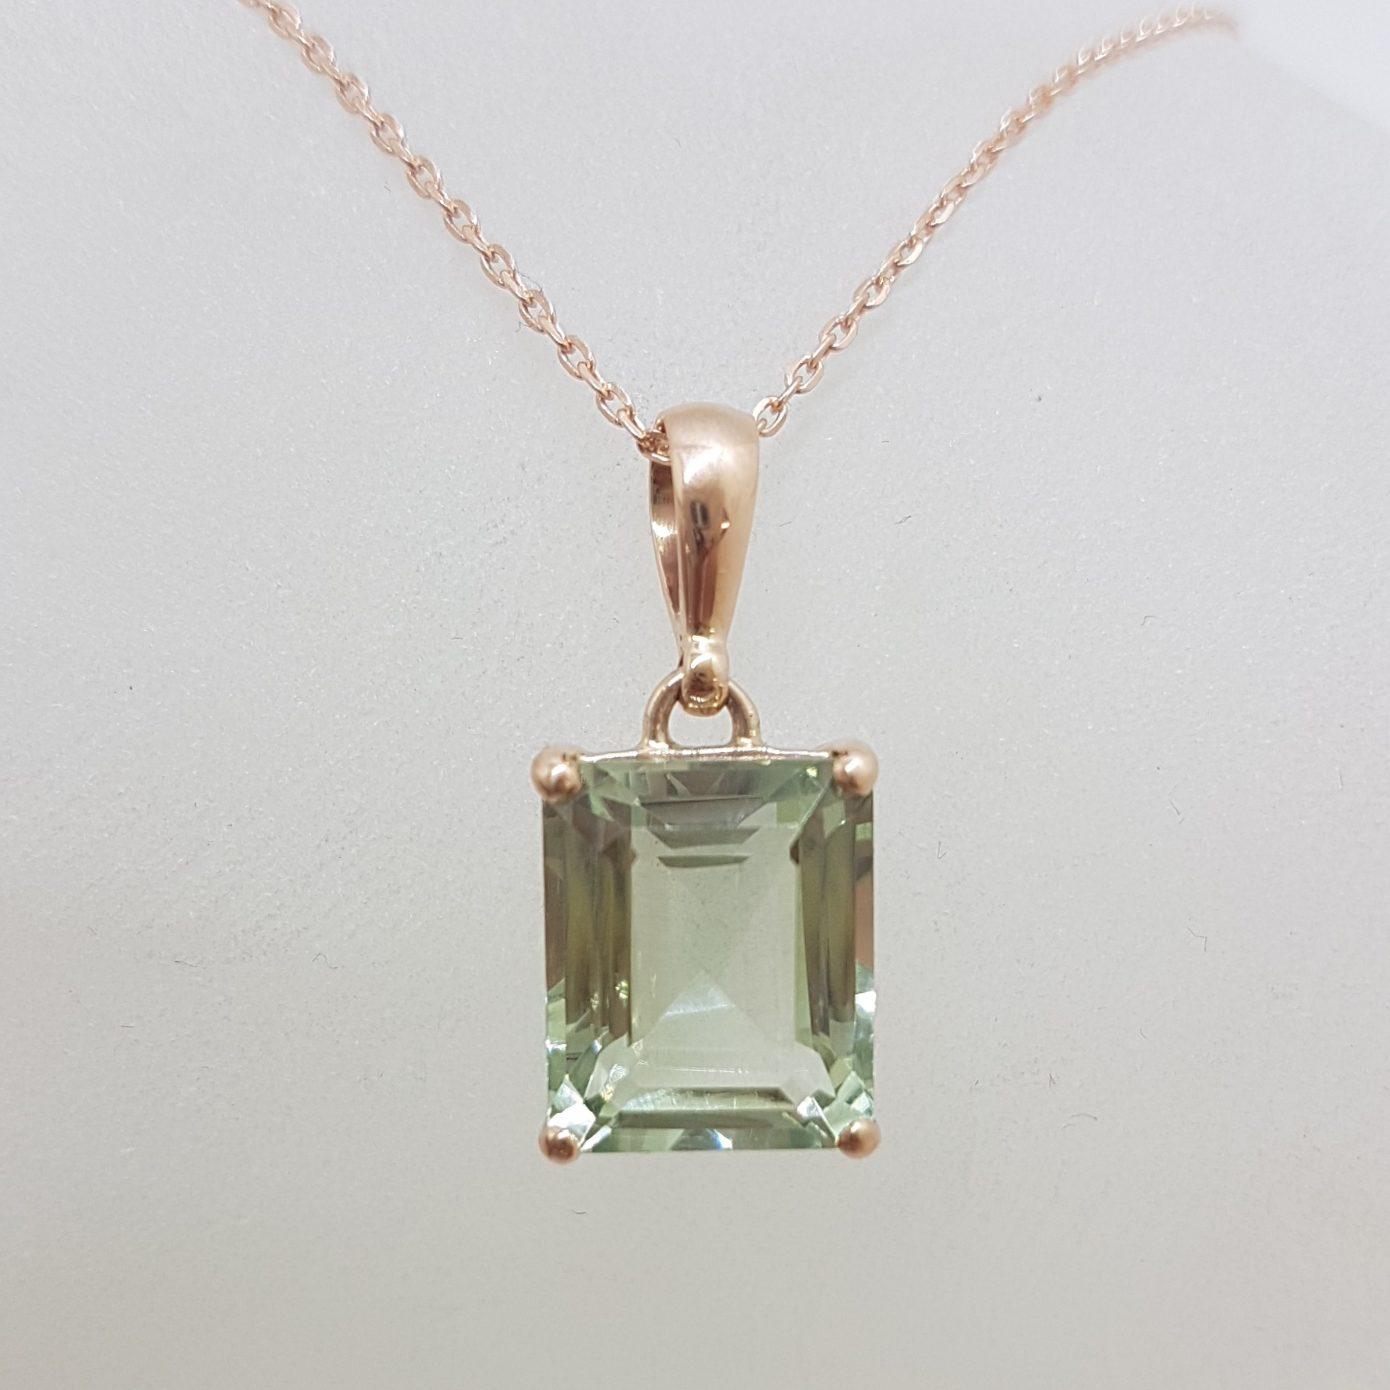 9ct Rose Gold Rectangular Green Amethyst / Prasiolite Claw Set Pendant on Gold Chain